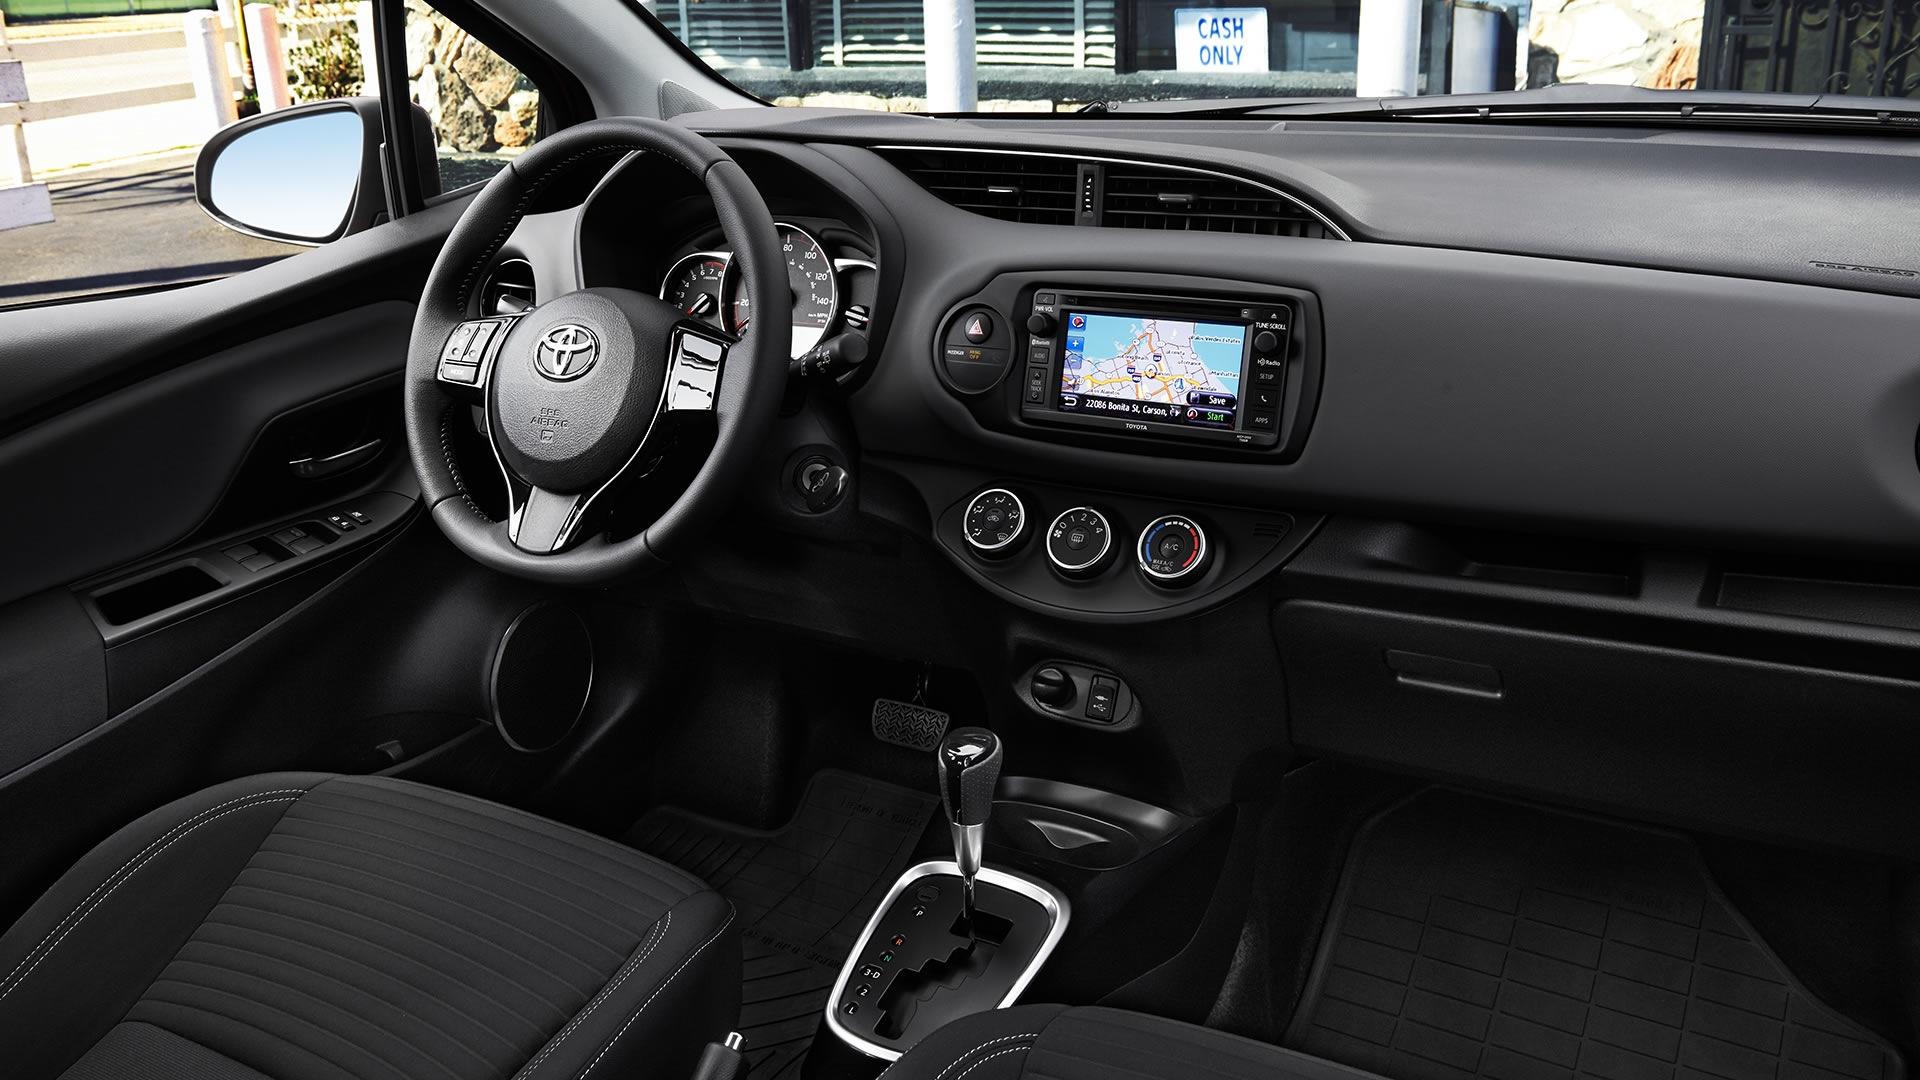 Kekurangan Toyota Yaris 2017 Spesifikasi